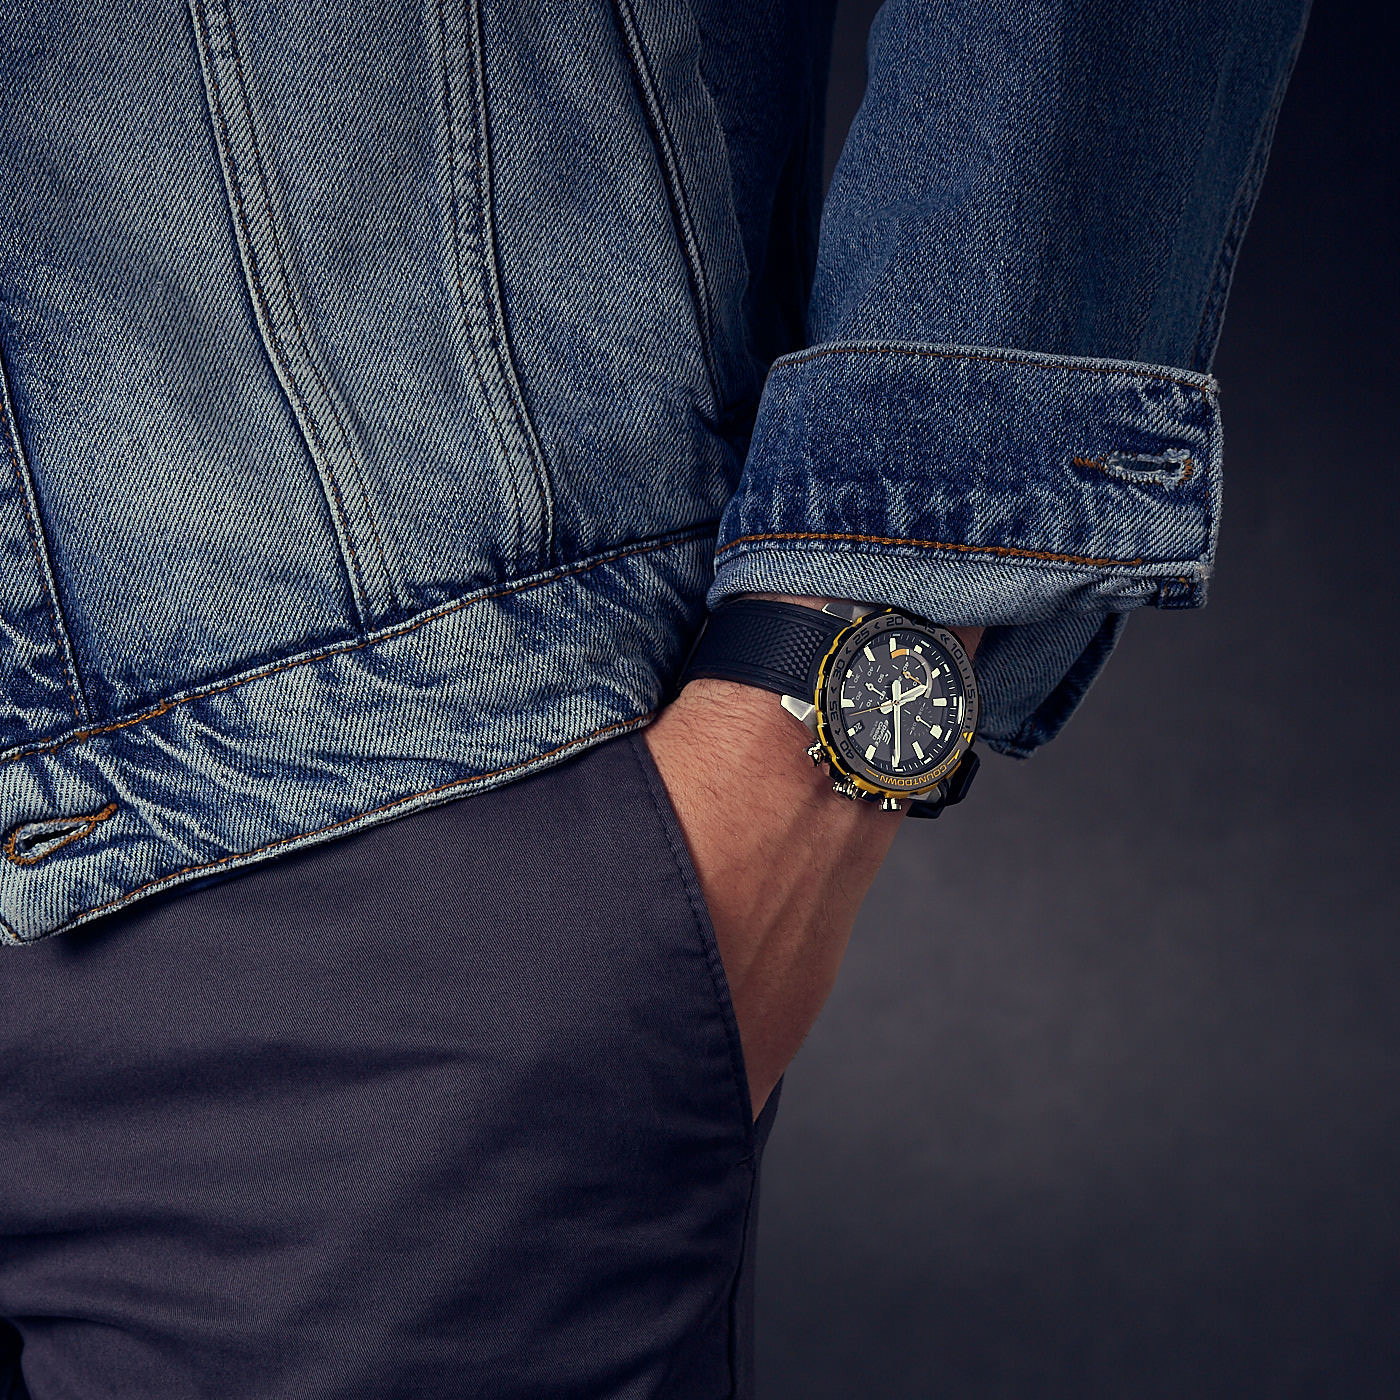 Edifice Classic Horloge EFR-566PB-1AVUEF